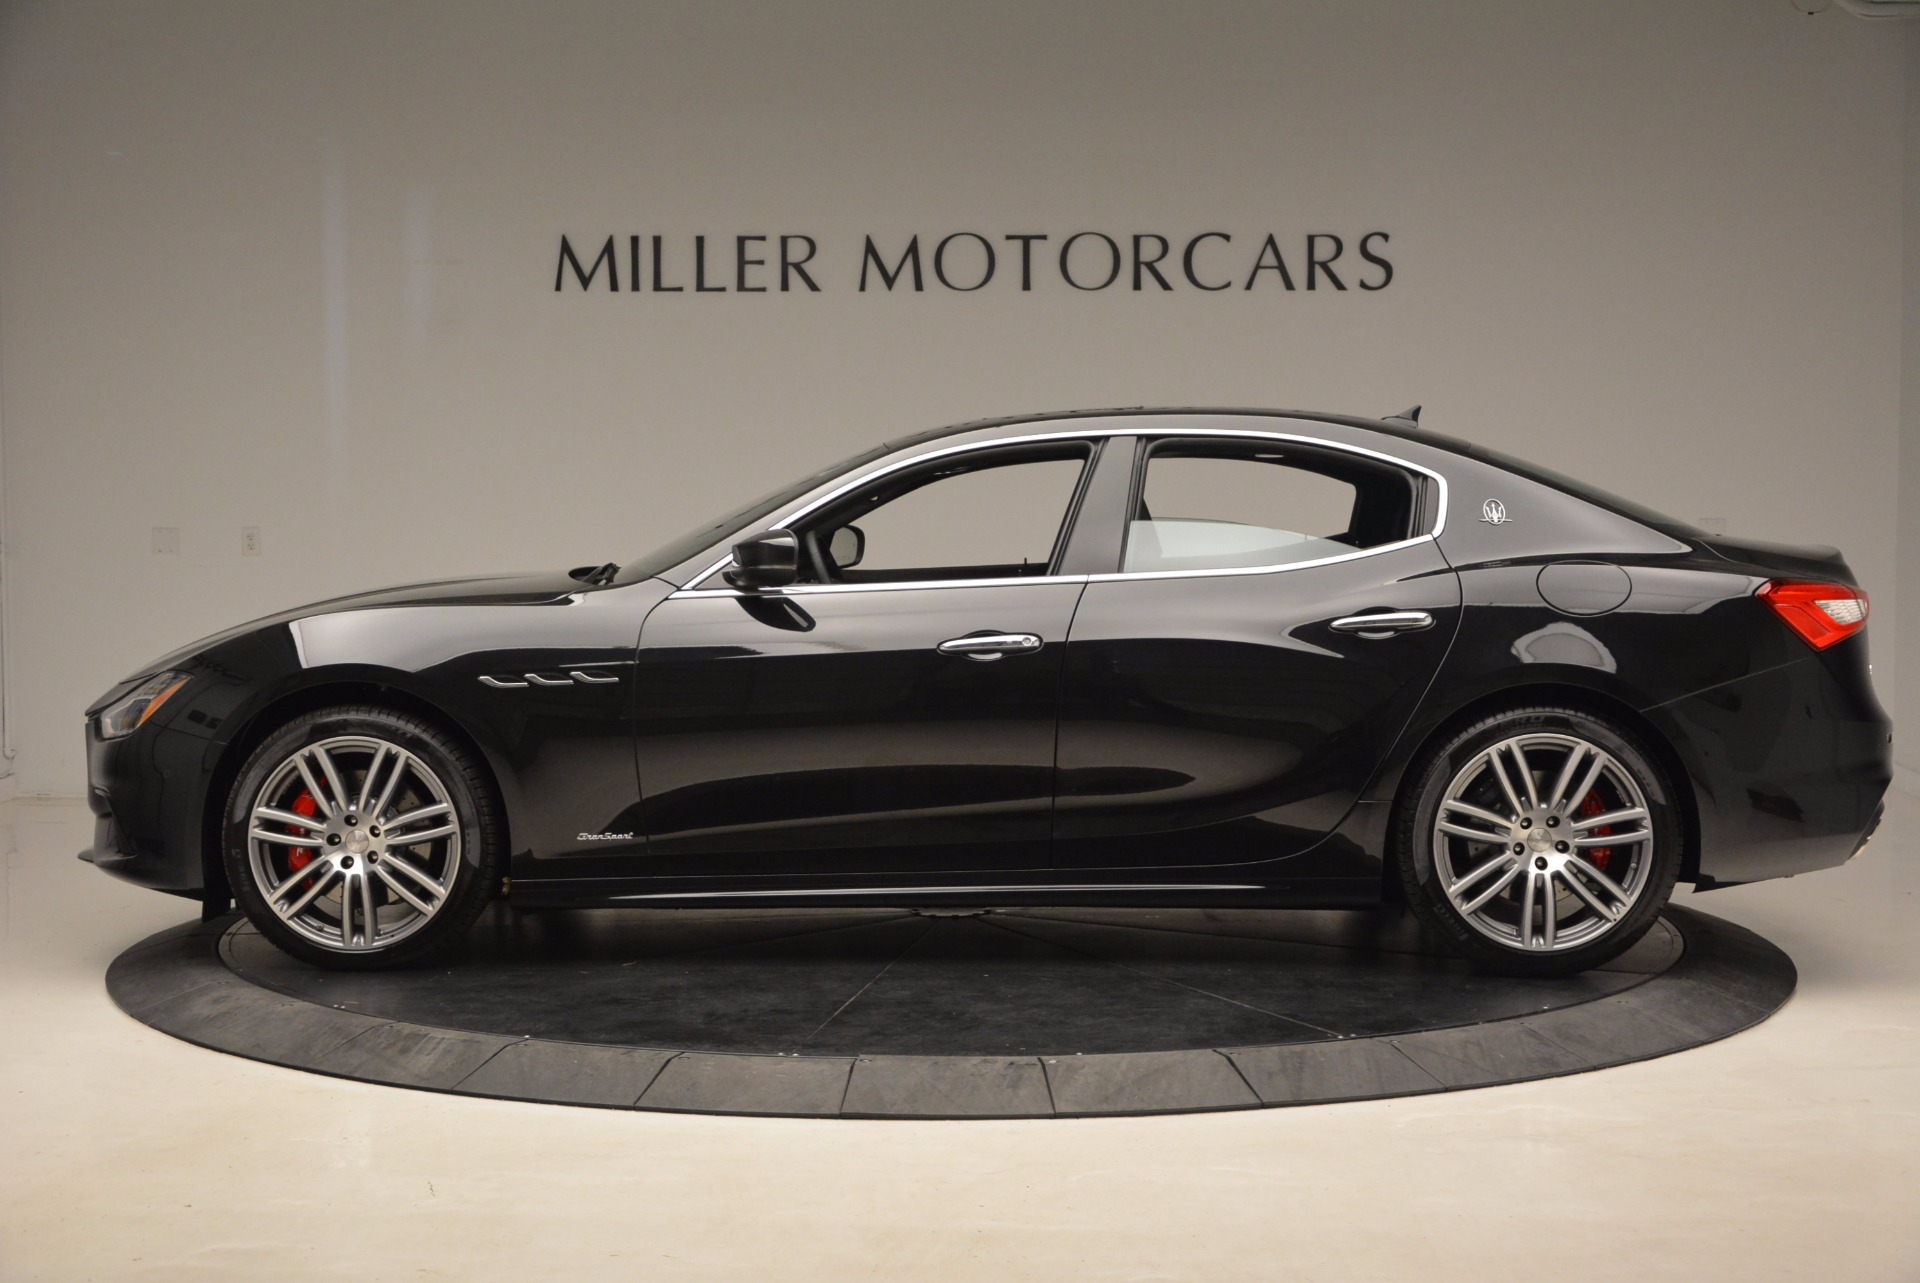 New 2018 Maserati Ghibli S Q4 Gransport For Sale In Greenwich, CT 1855_p3